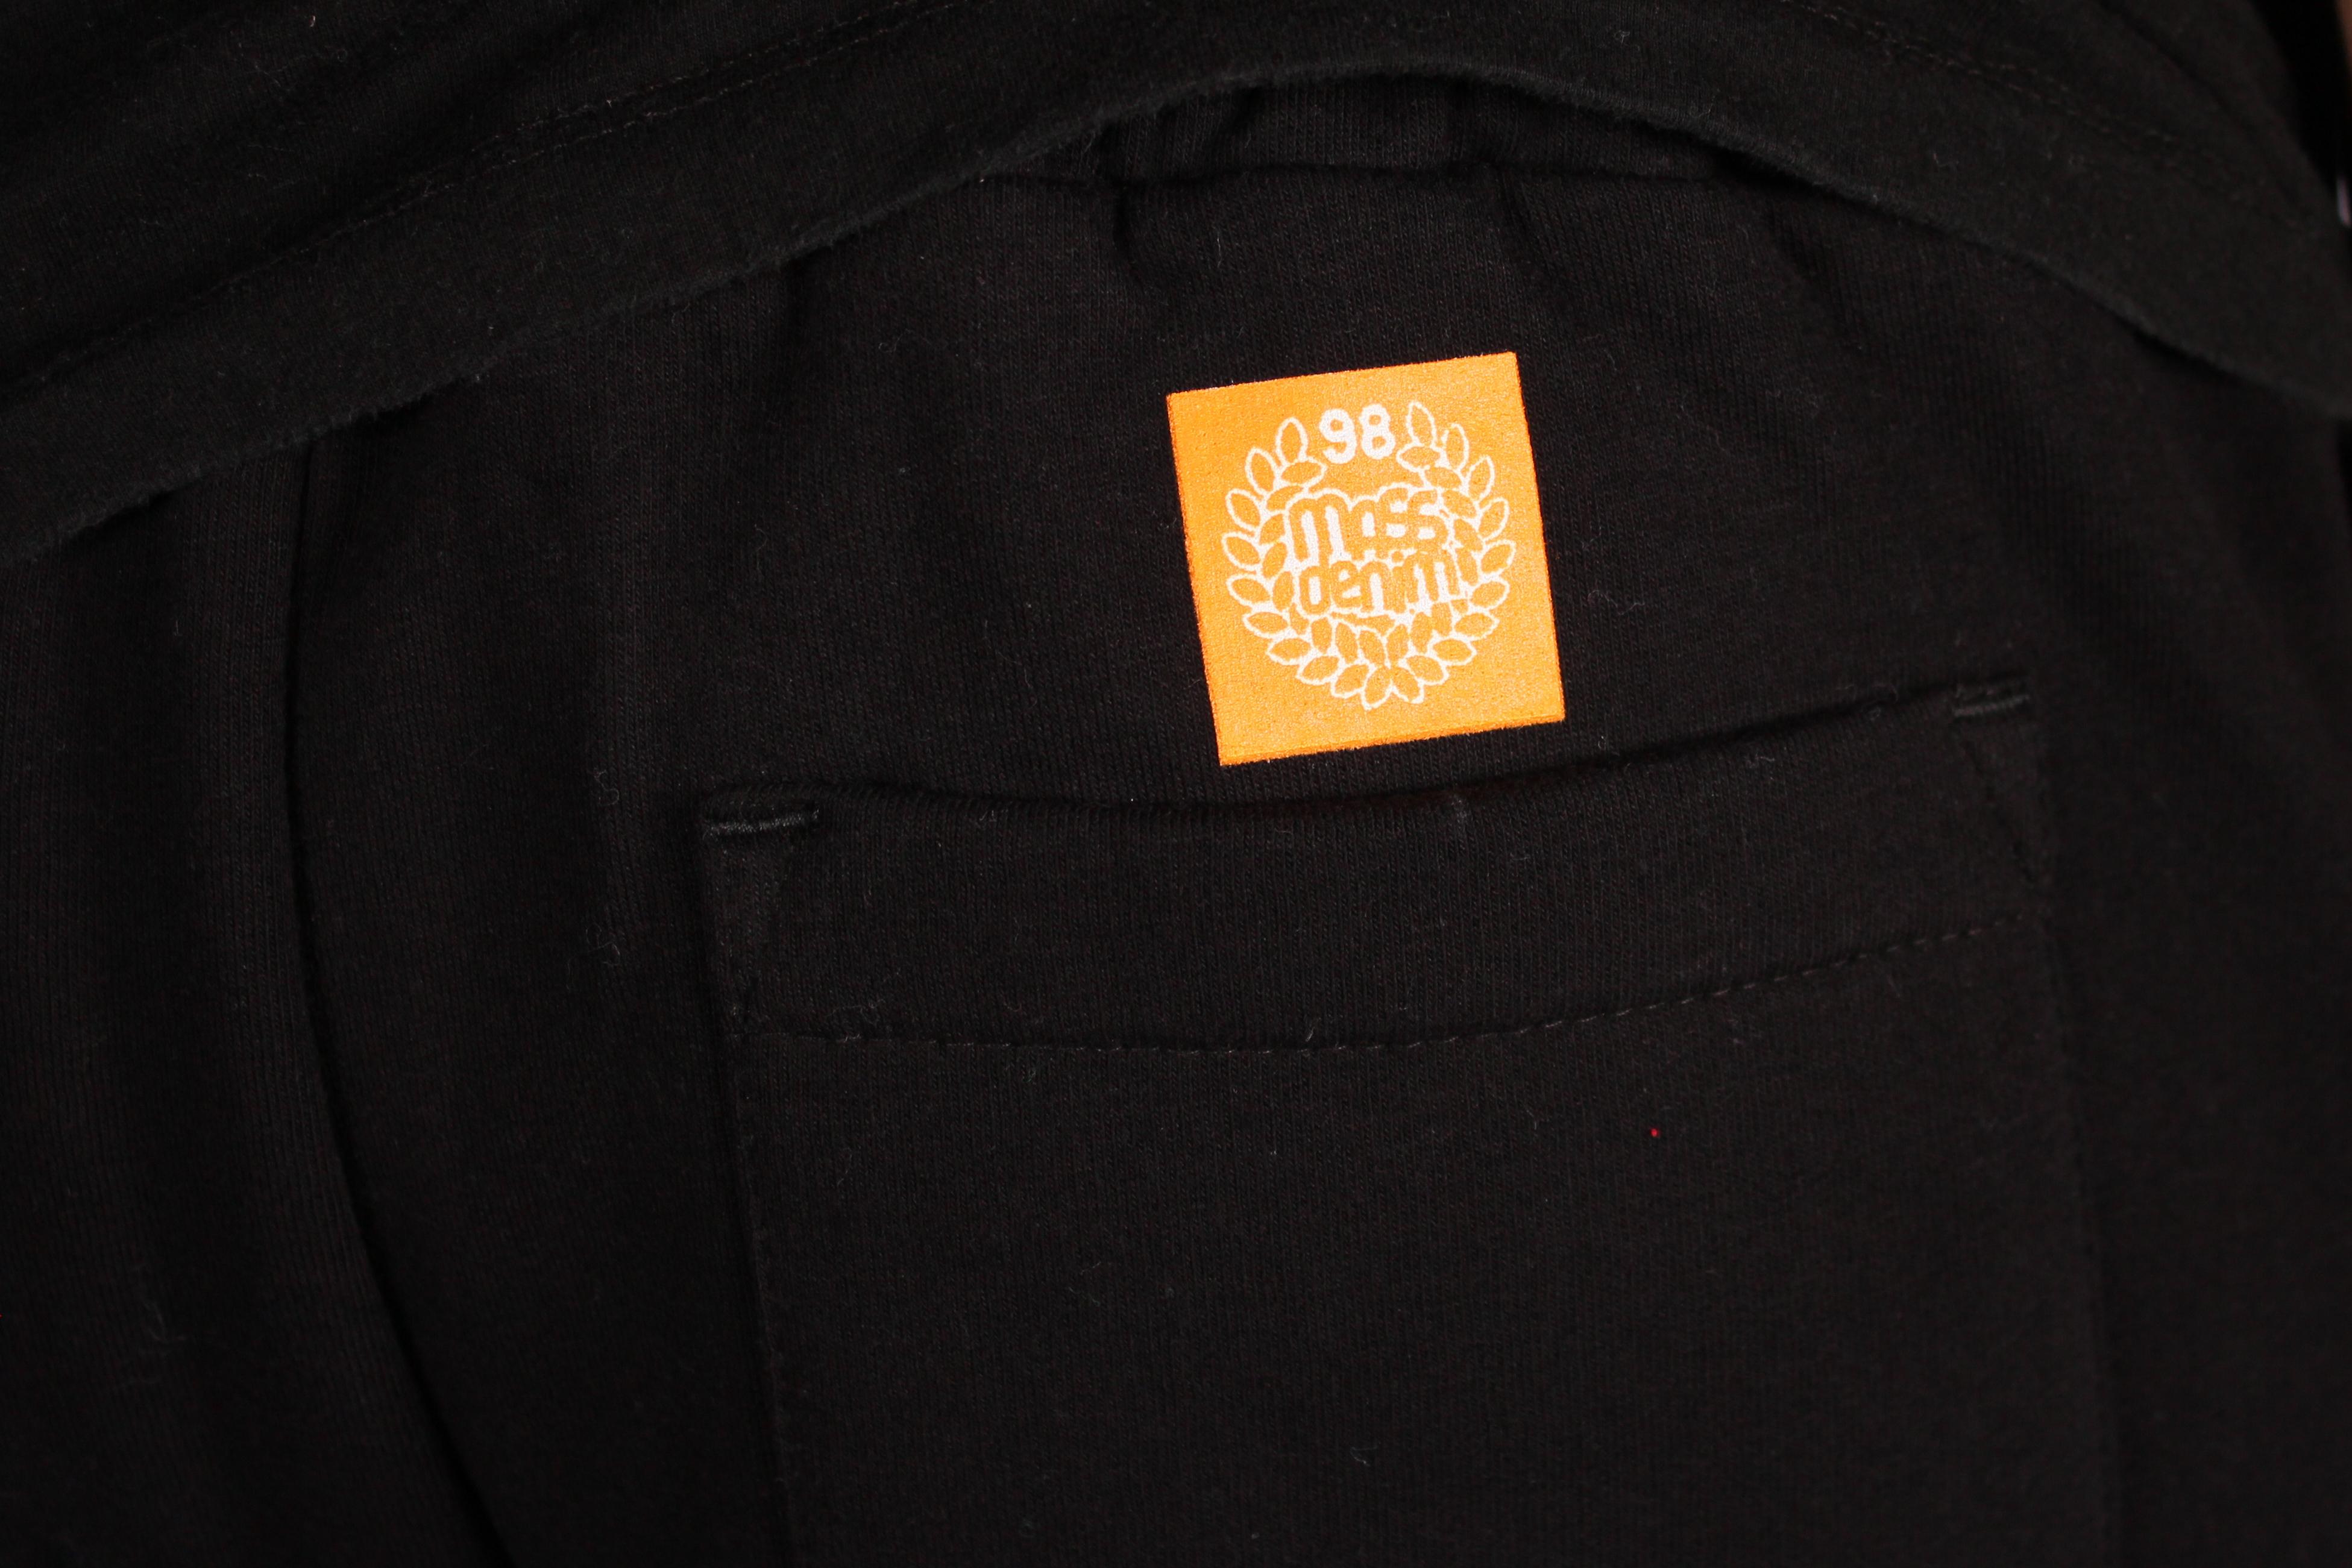 Spodnie Dresowe Mass Dnm Base (Black)